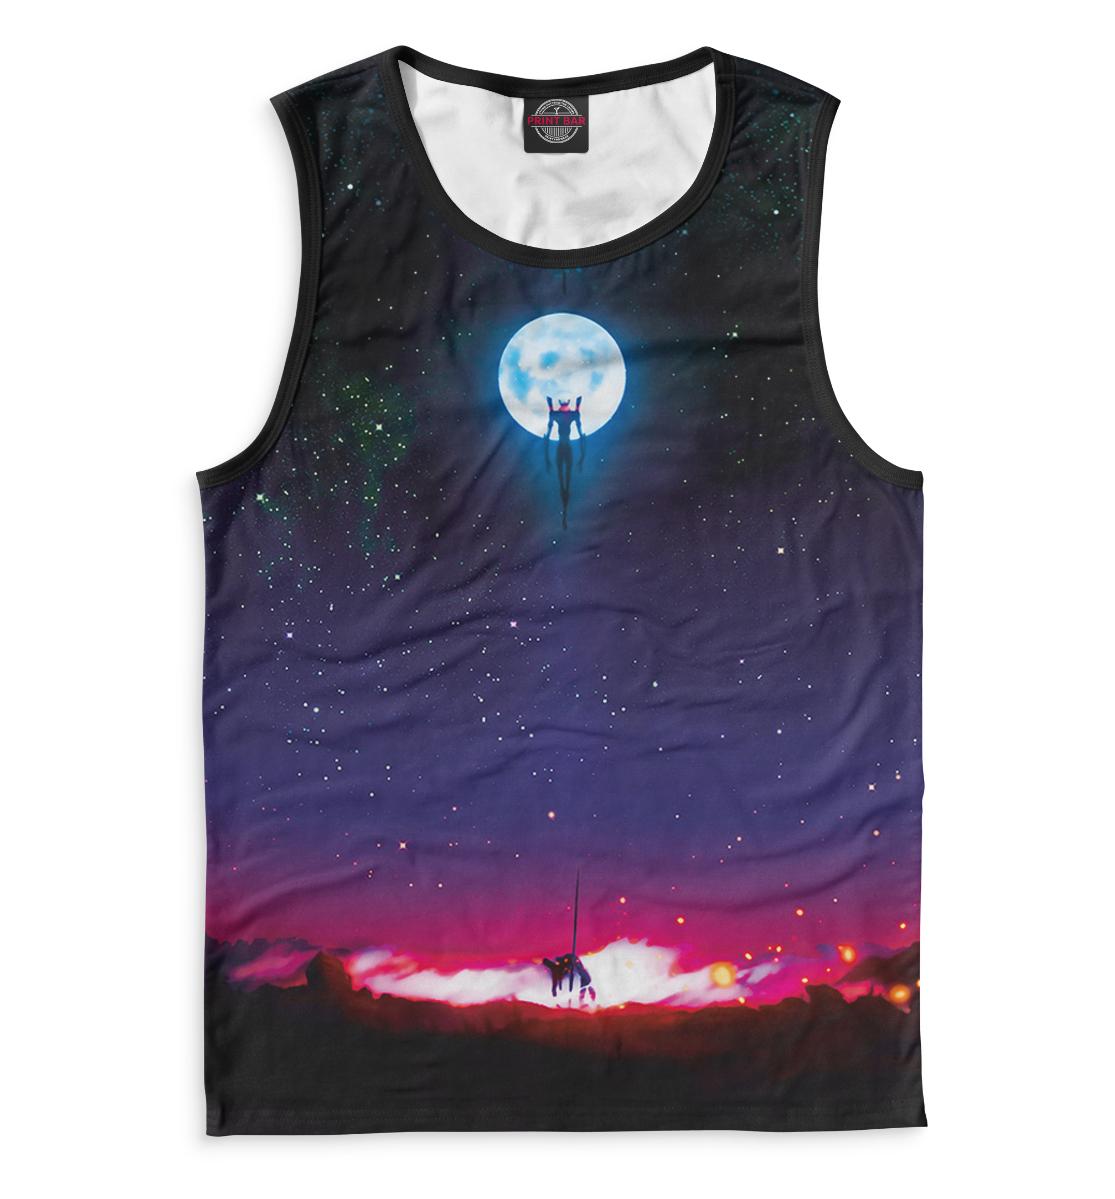 Купить Neon Genesis Evangelion, Printbar, Майки, EVA-916564-may-2